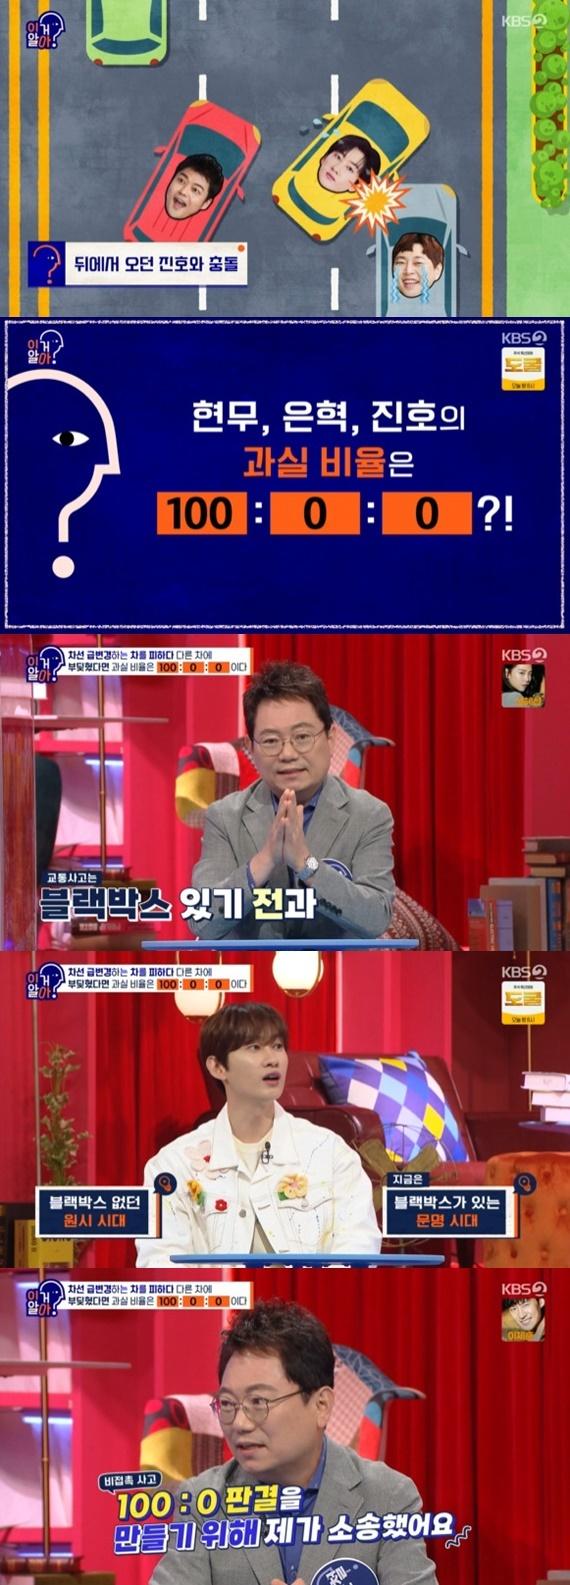 KBS 2TV '지식 플렉스 쇼-이거 알아?' © 뉴스1